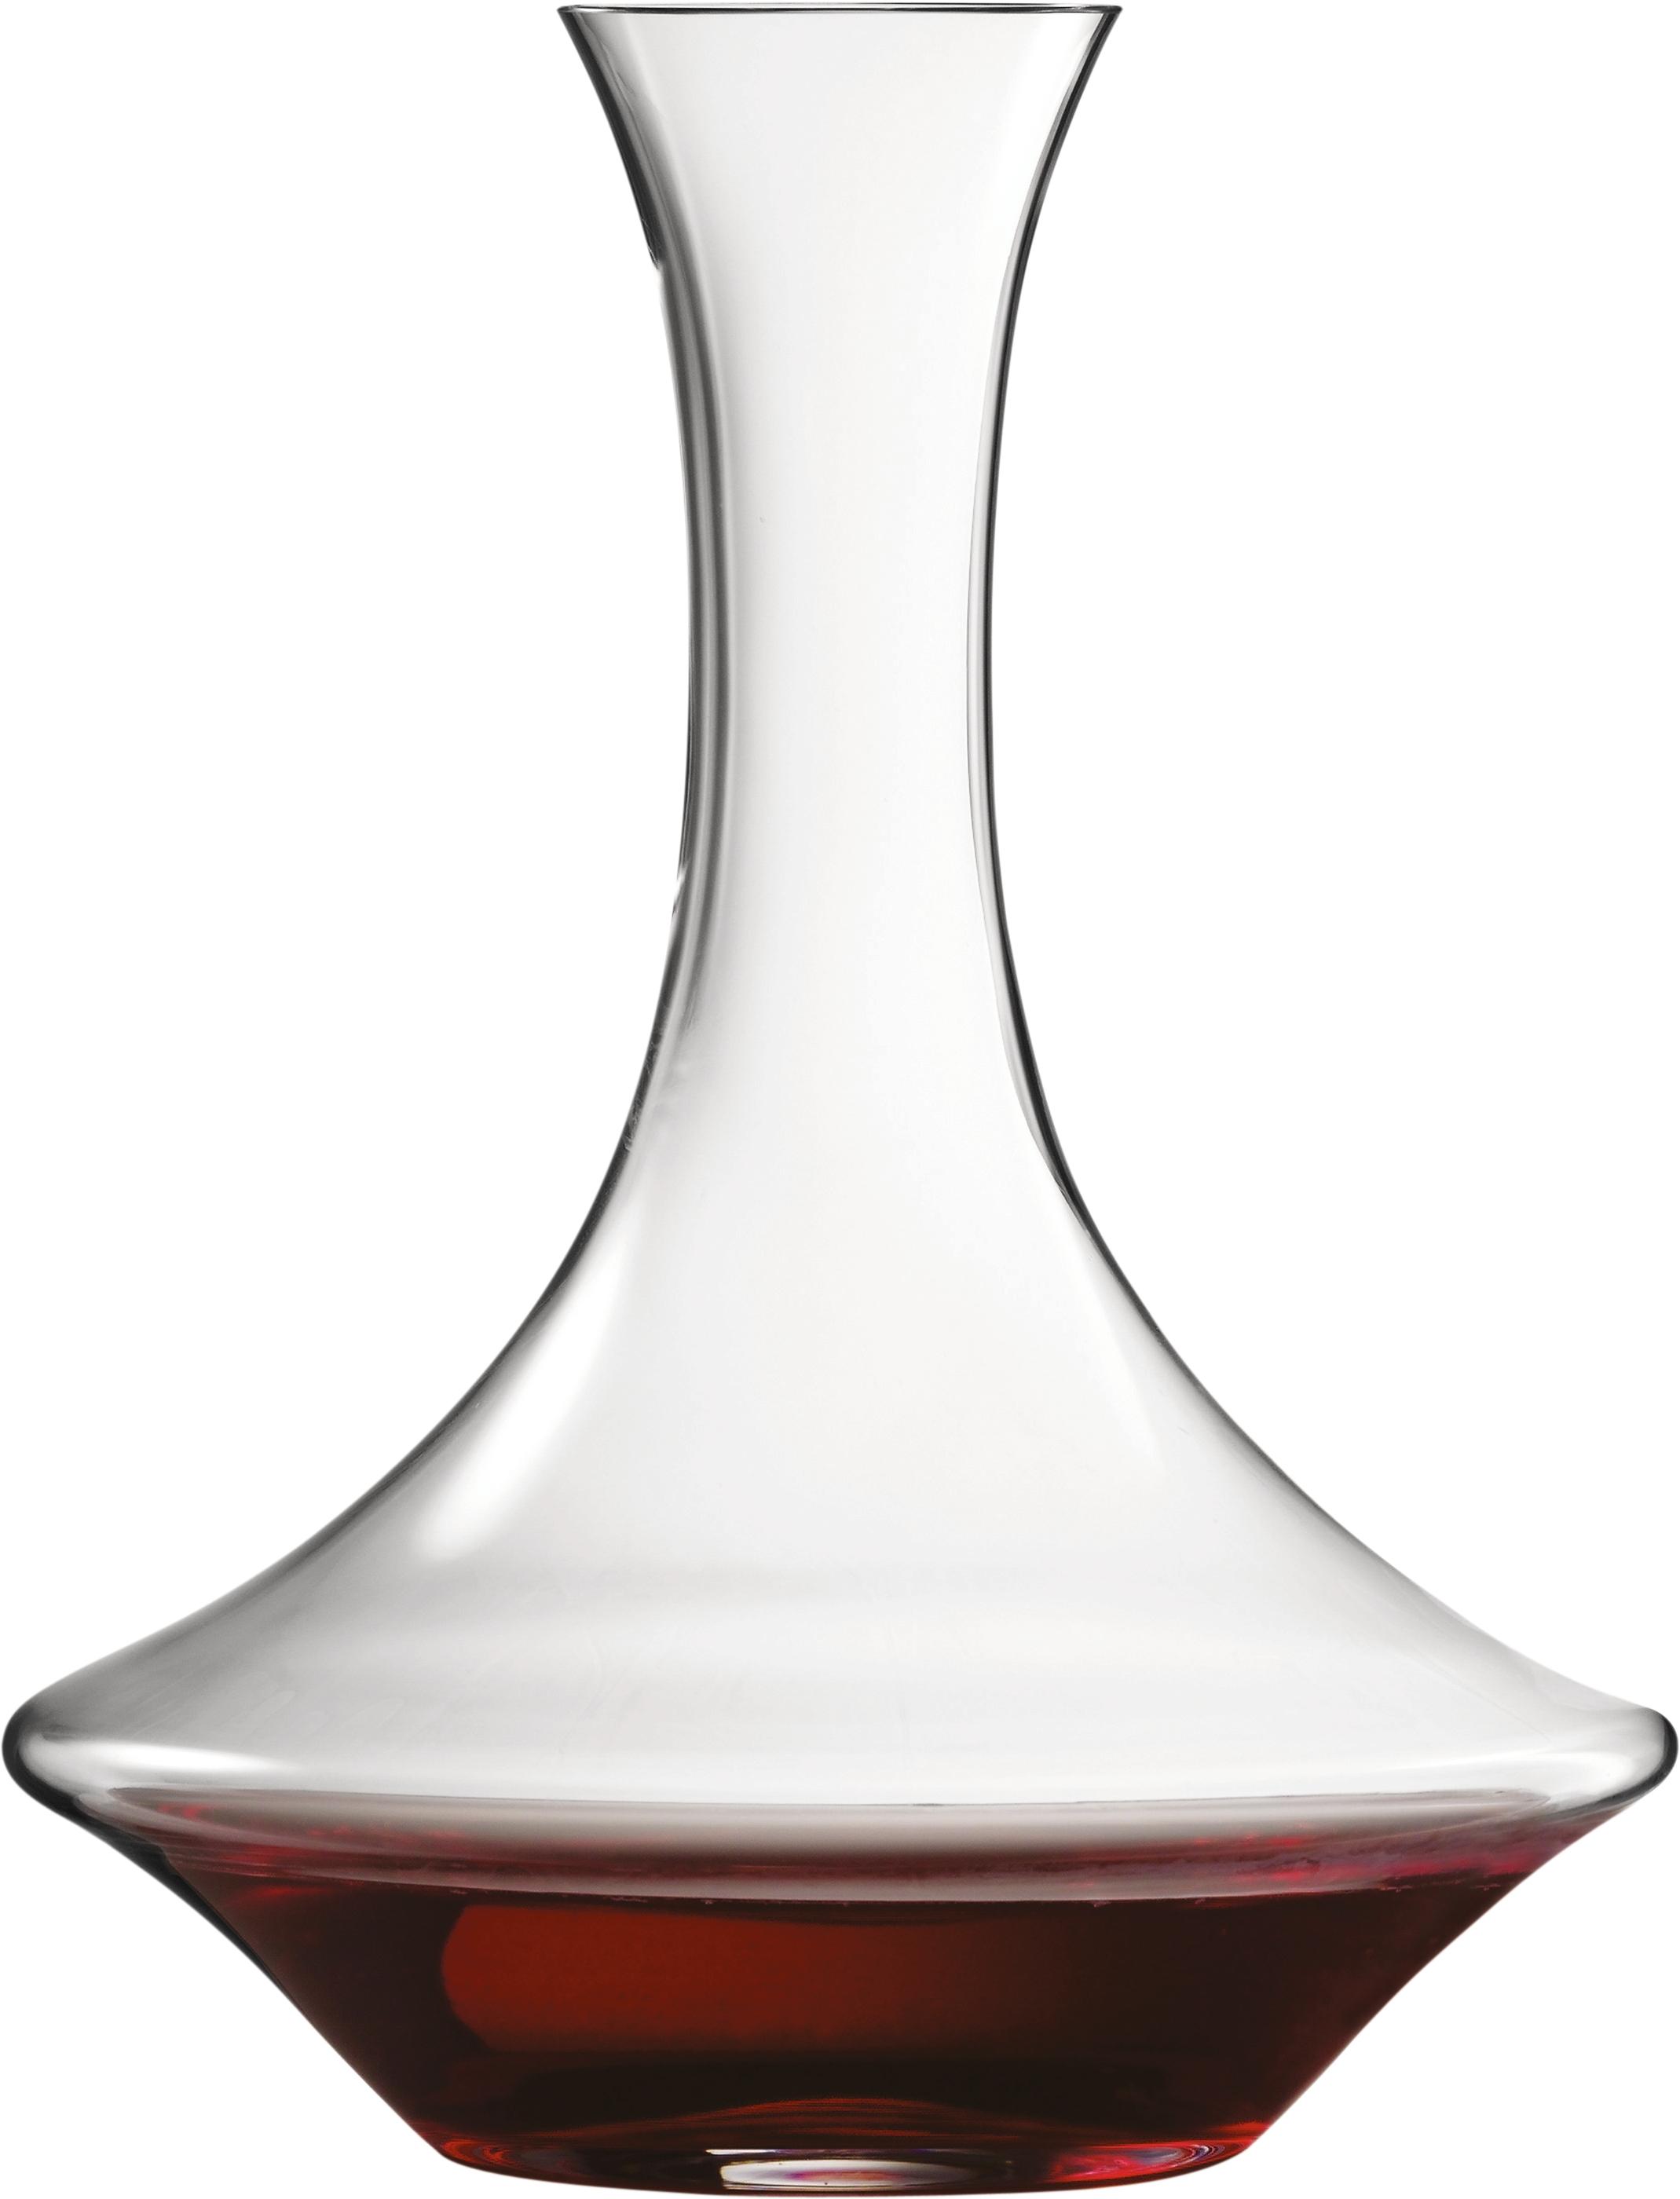 Spiegelau Crystal Wine Grande Decanter